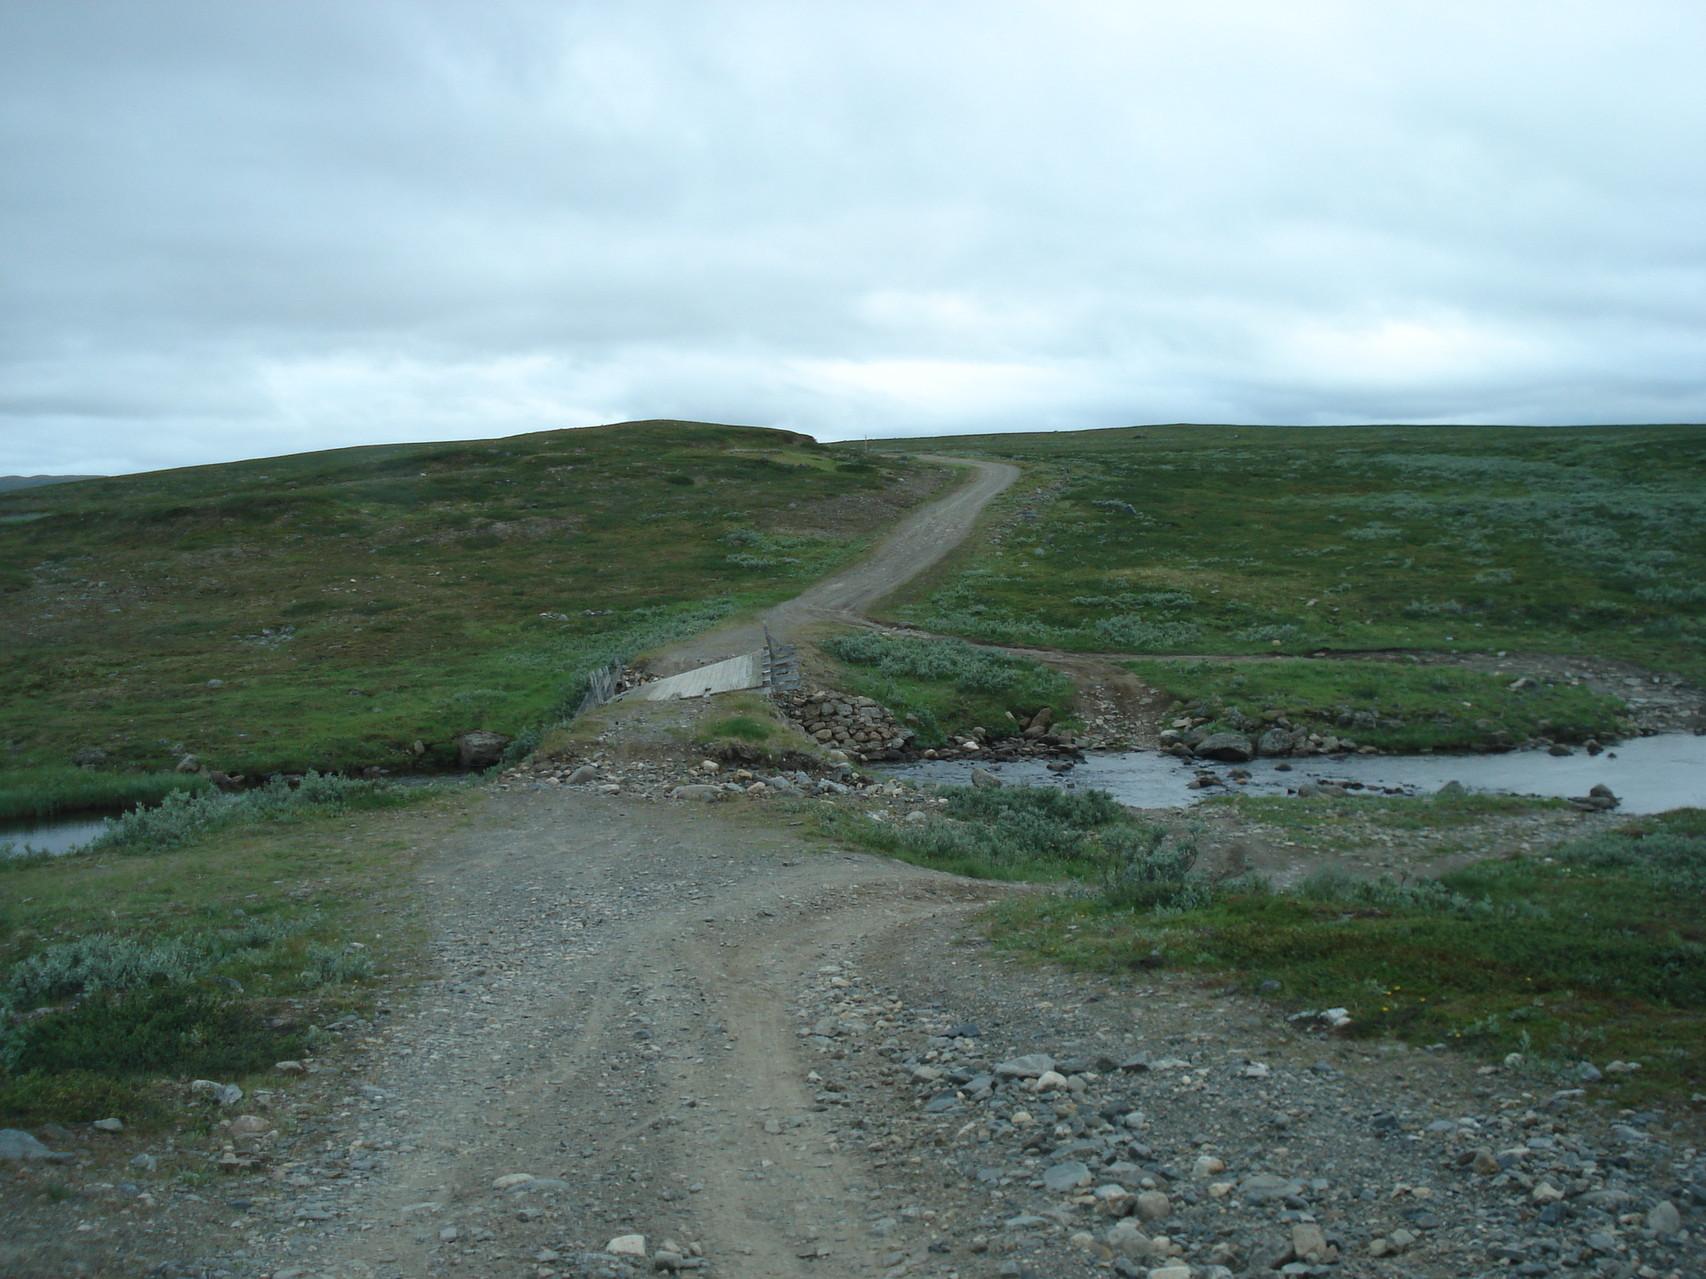 Furt in Lappland